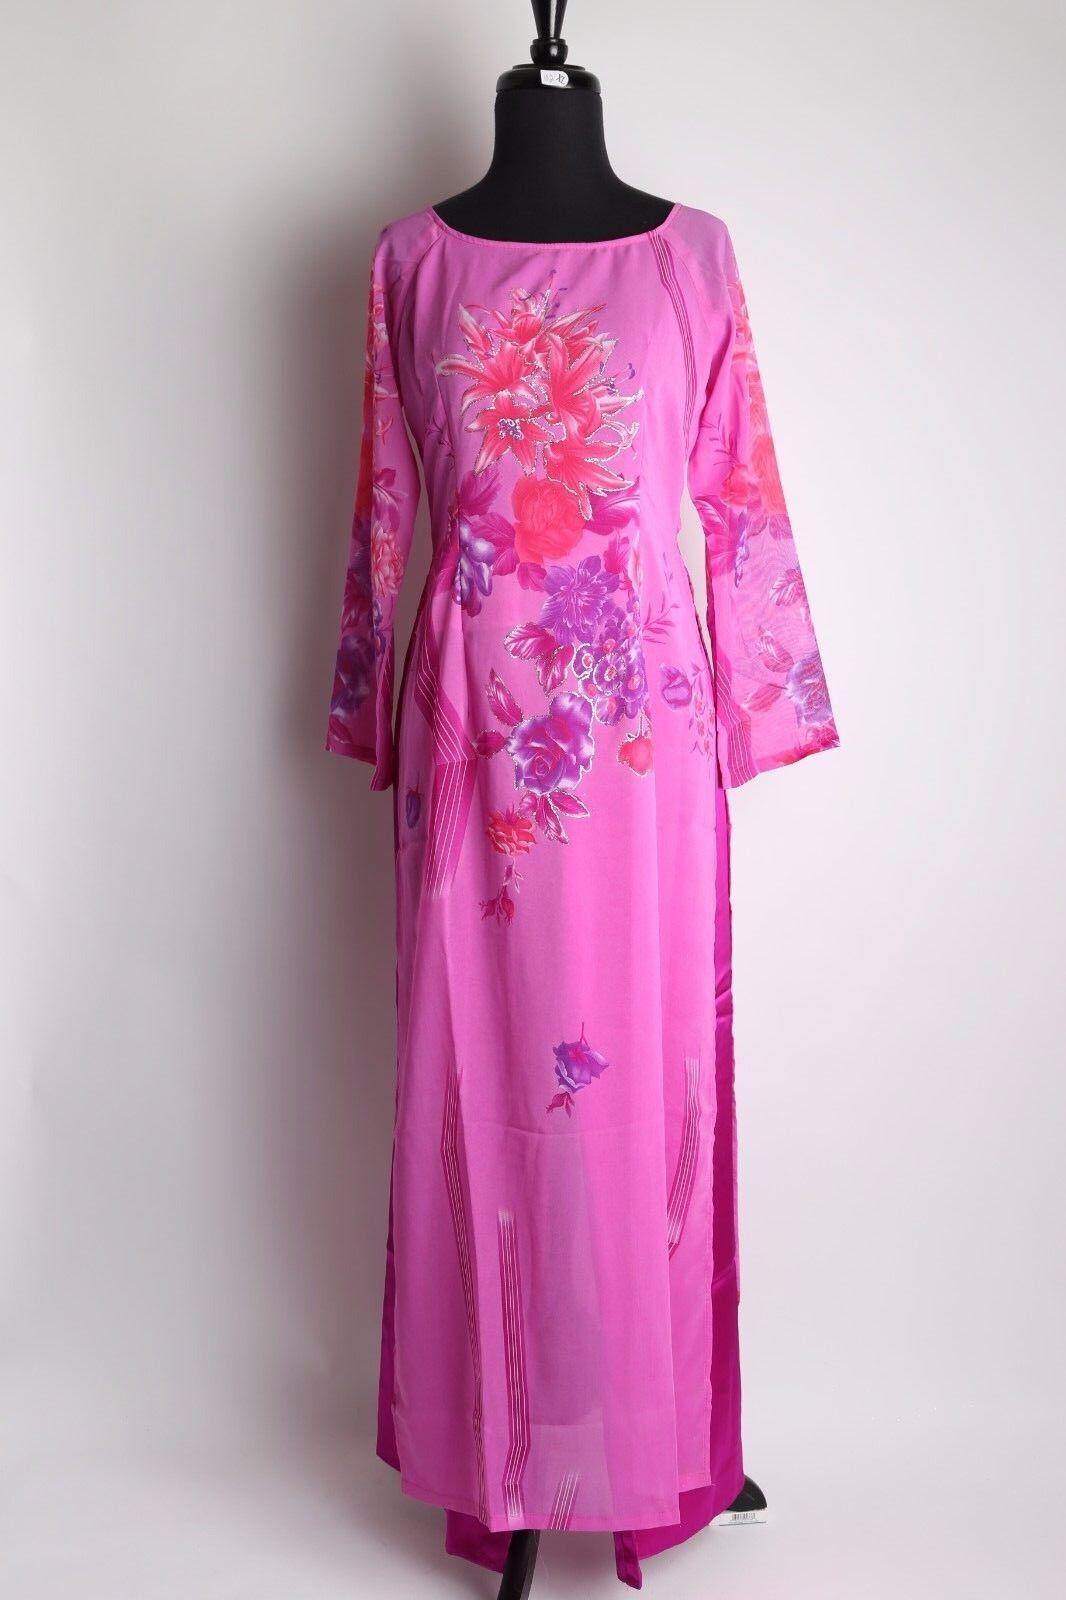 2651b2abff09 Vietnamese Ao Dai Dress - Women's Glitter Pink Floral Ao Dai w Size 3XL -  Pants okzhly6821-Dresses